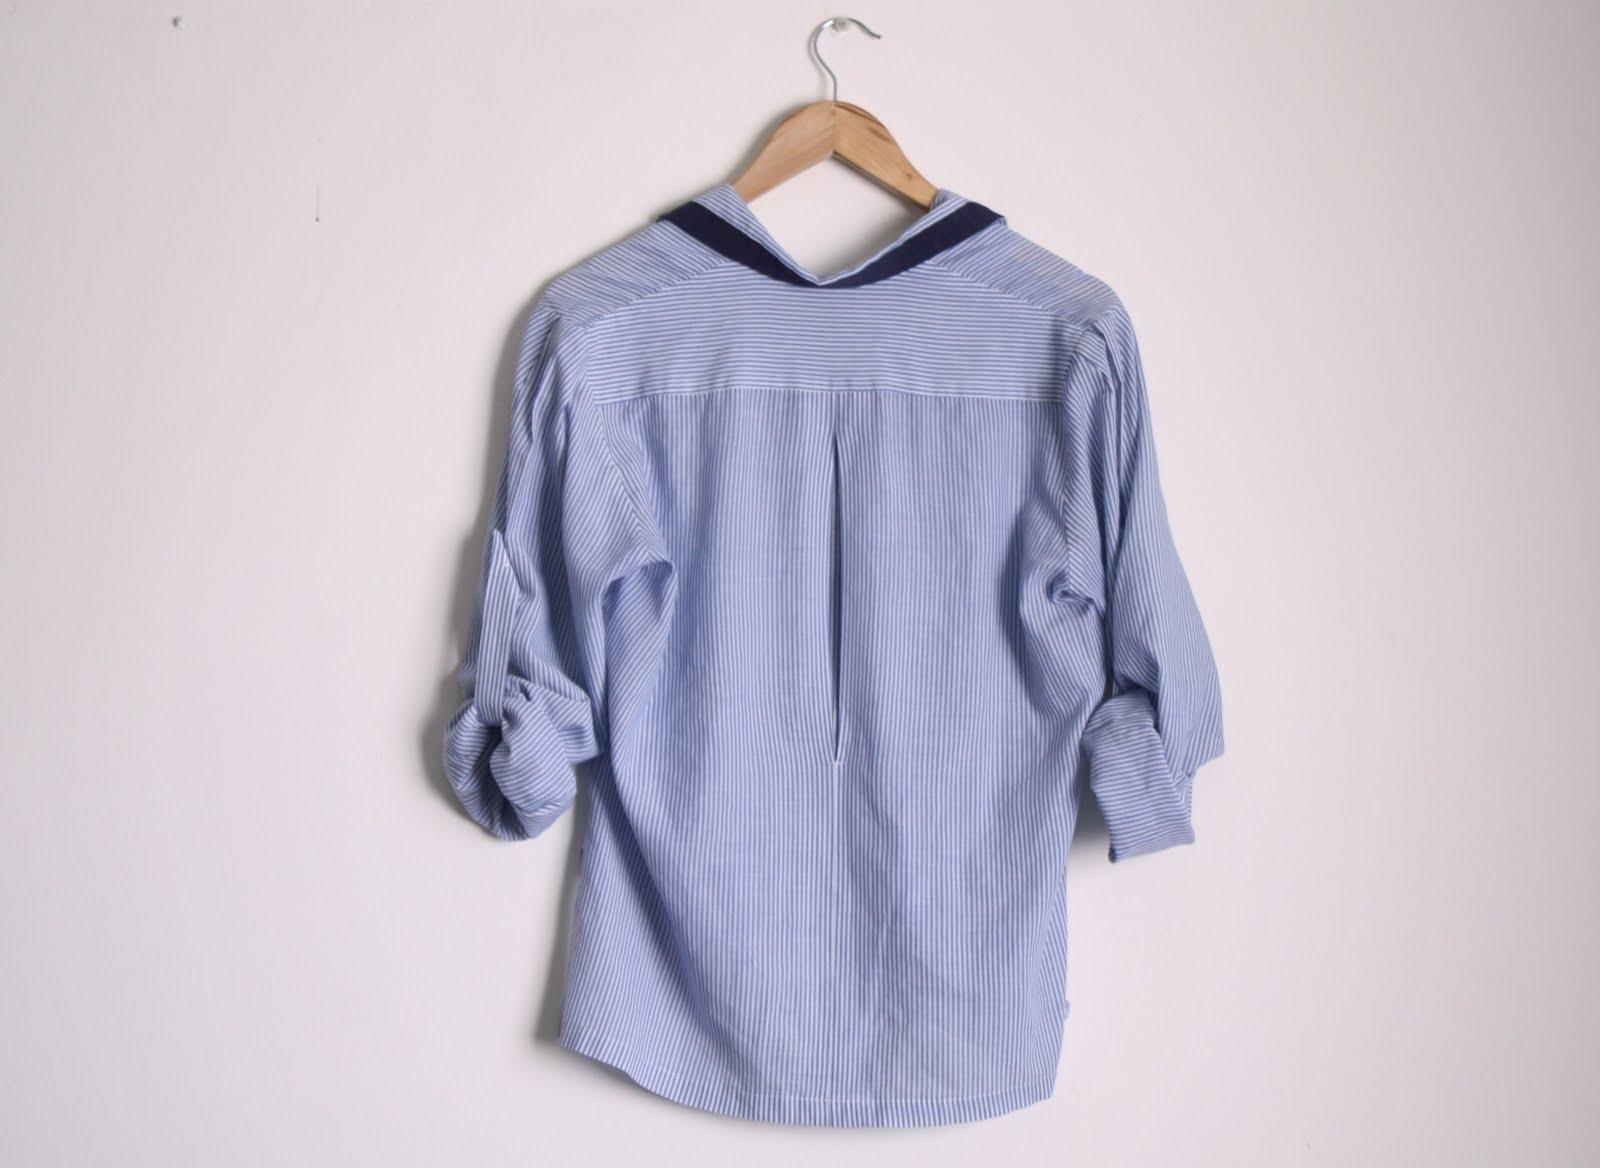 Wardrobe Purge Sold Thrifted Light Blue Pinstripe Shirt